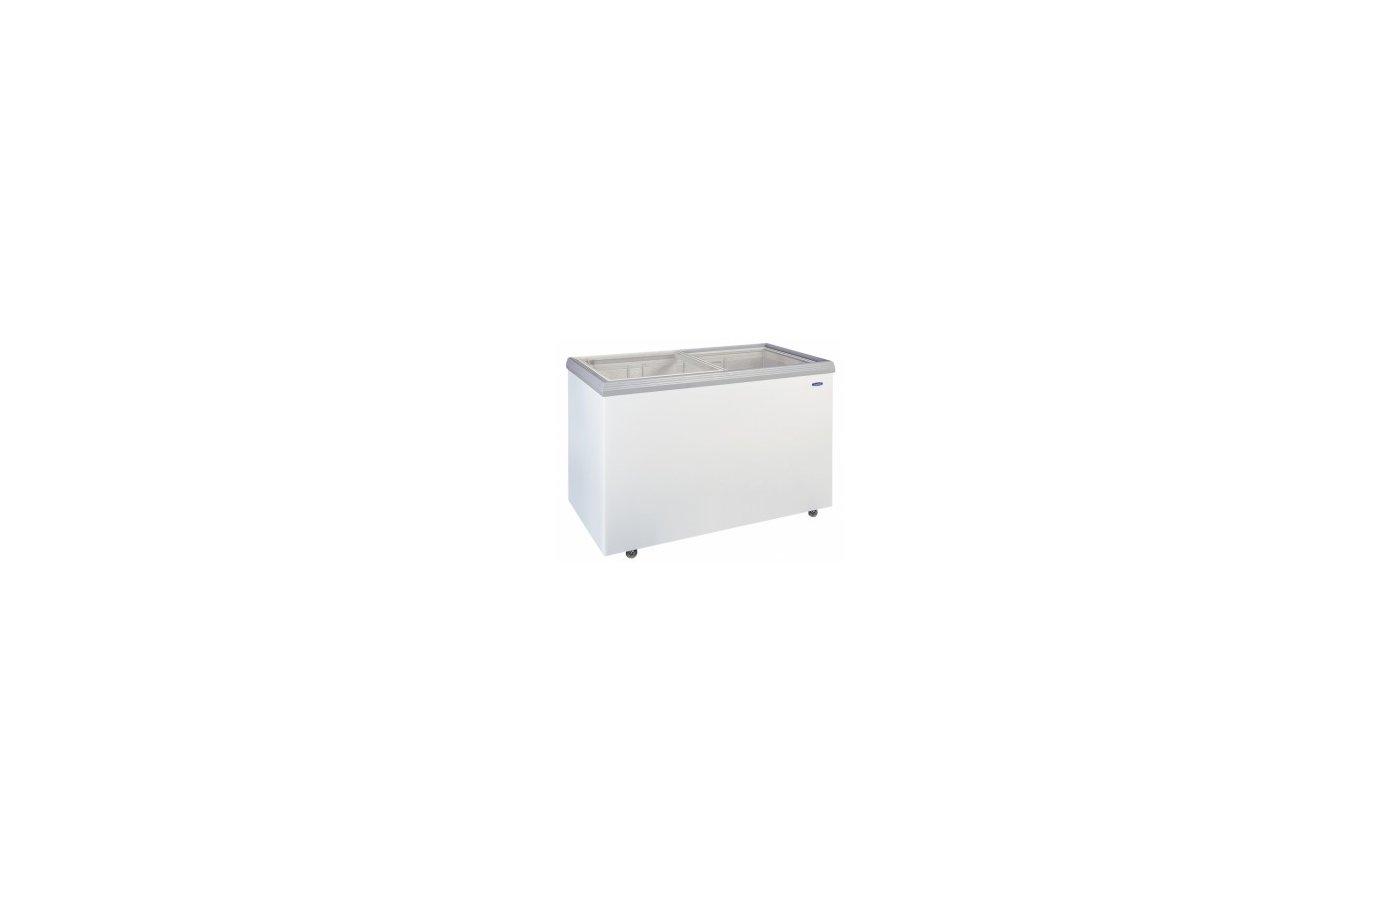 Морозильный ларь БИРЮСА Б-355Н-5